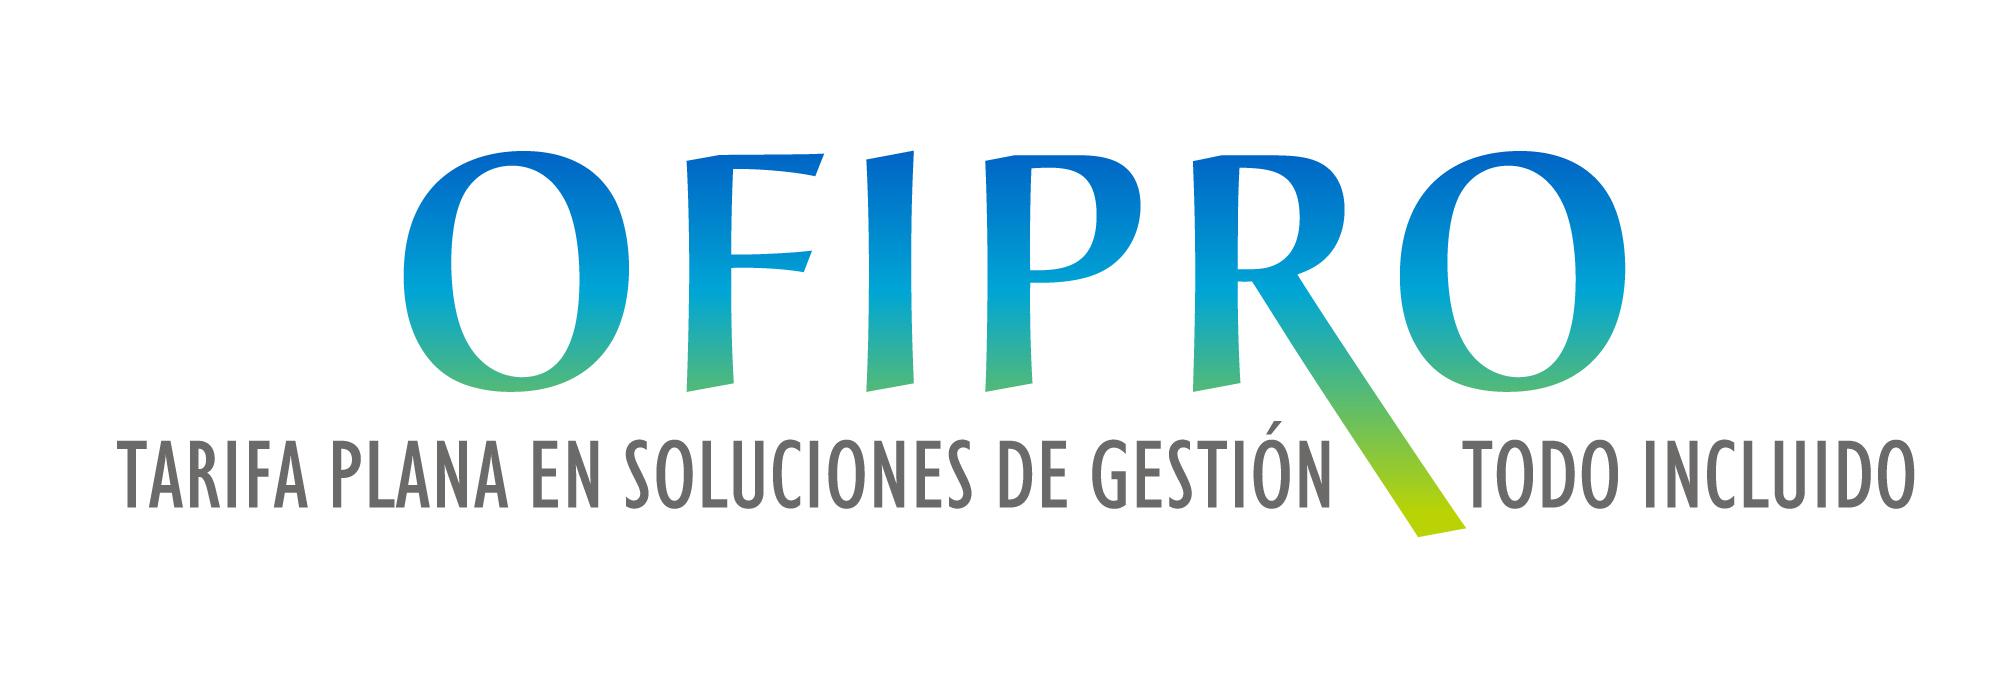 OfiPro logo